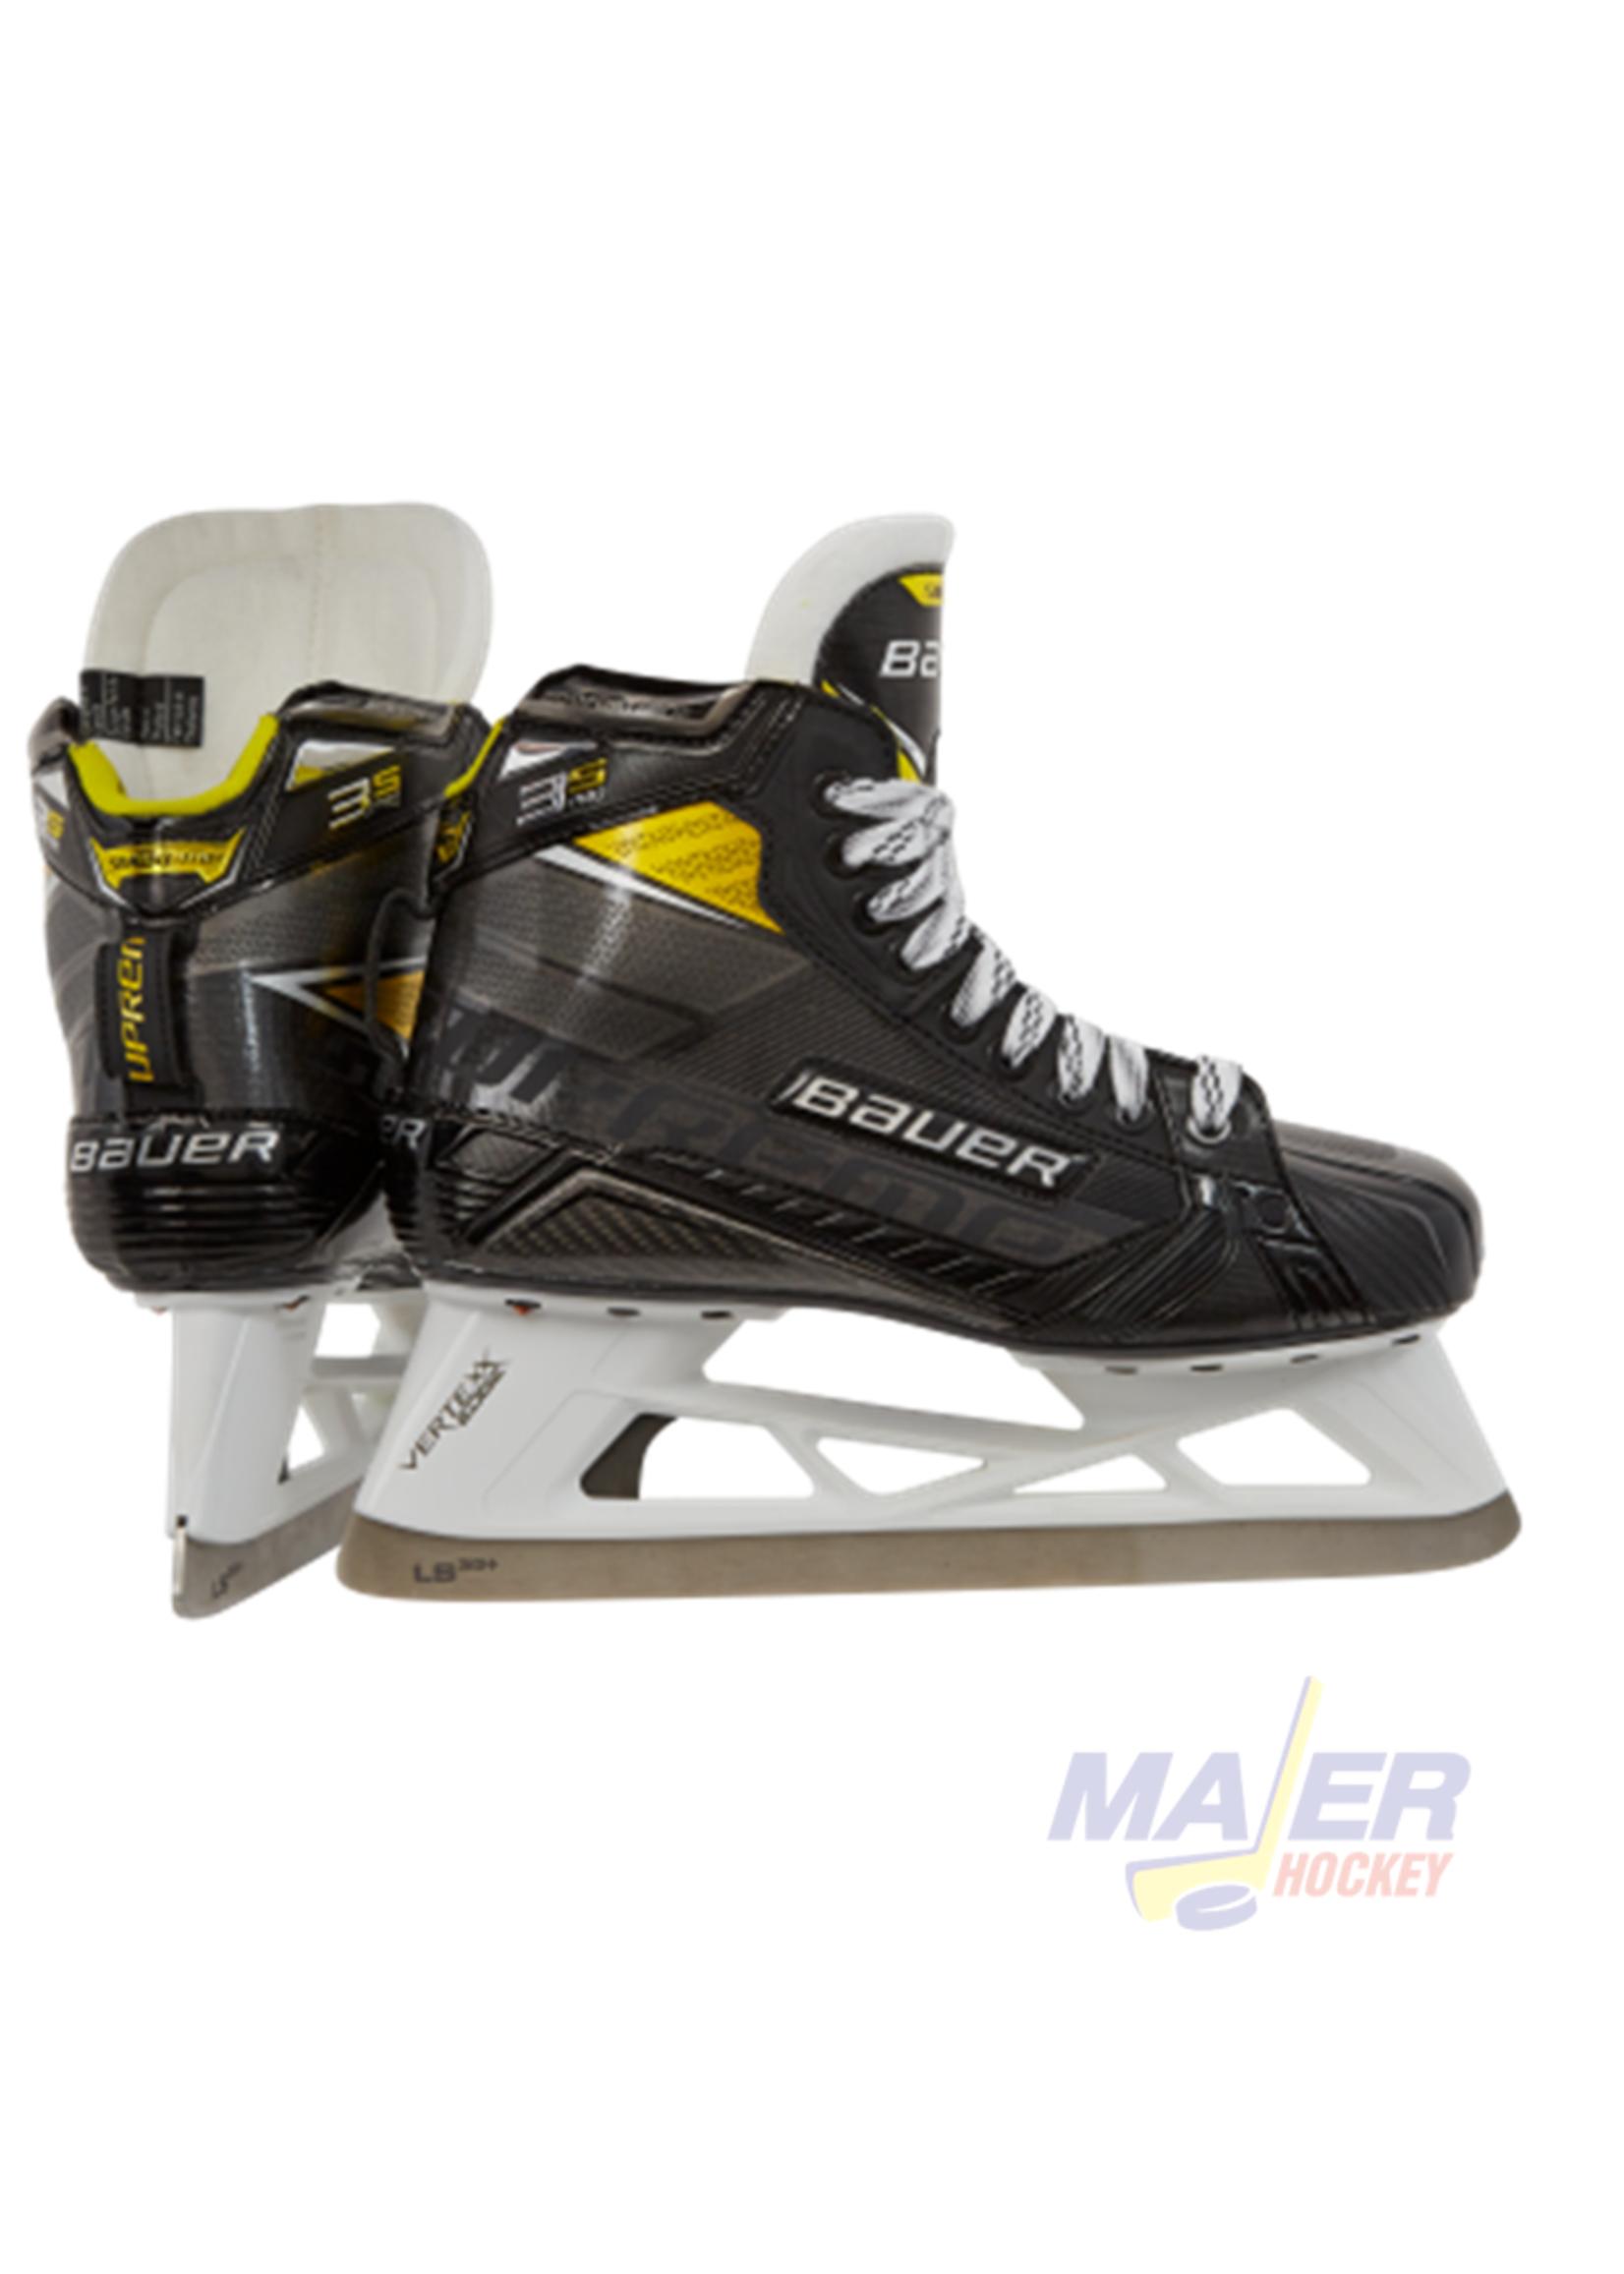 Bauer Supreme 3S Pro Senior Goalie Skates